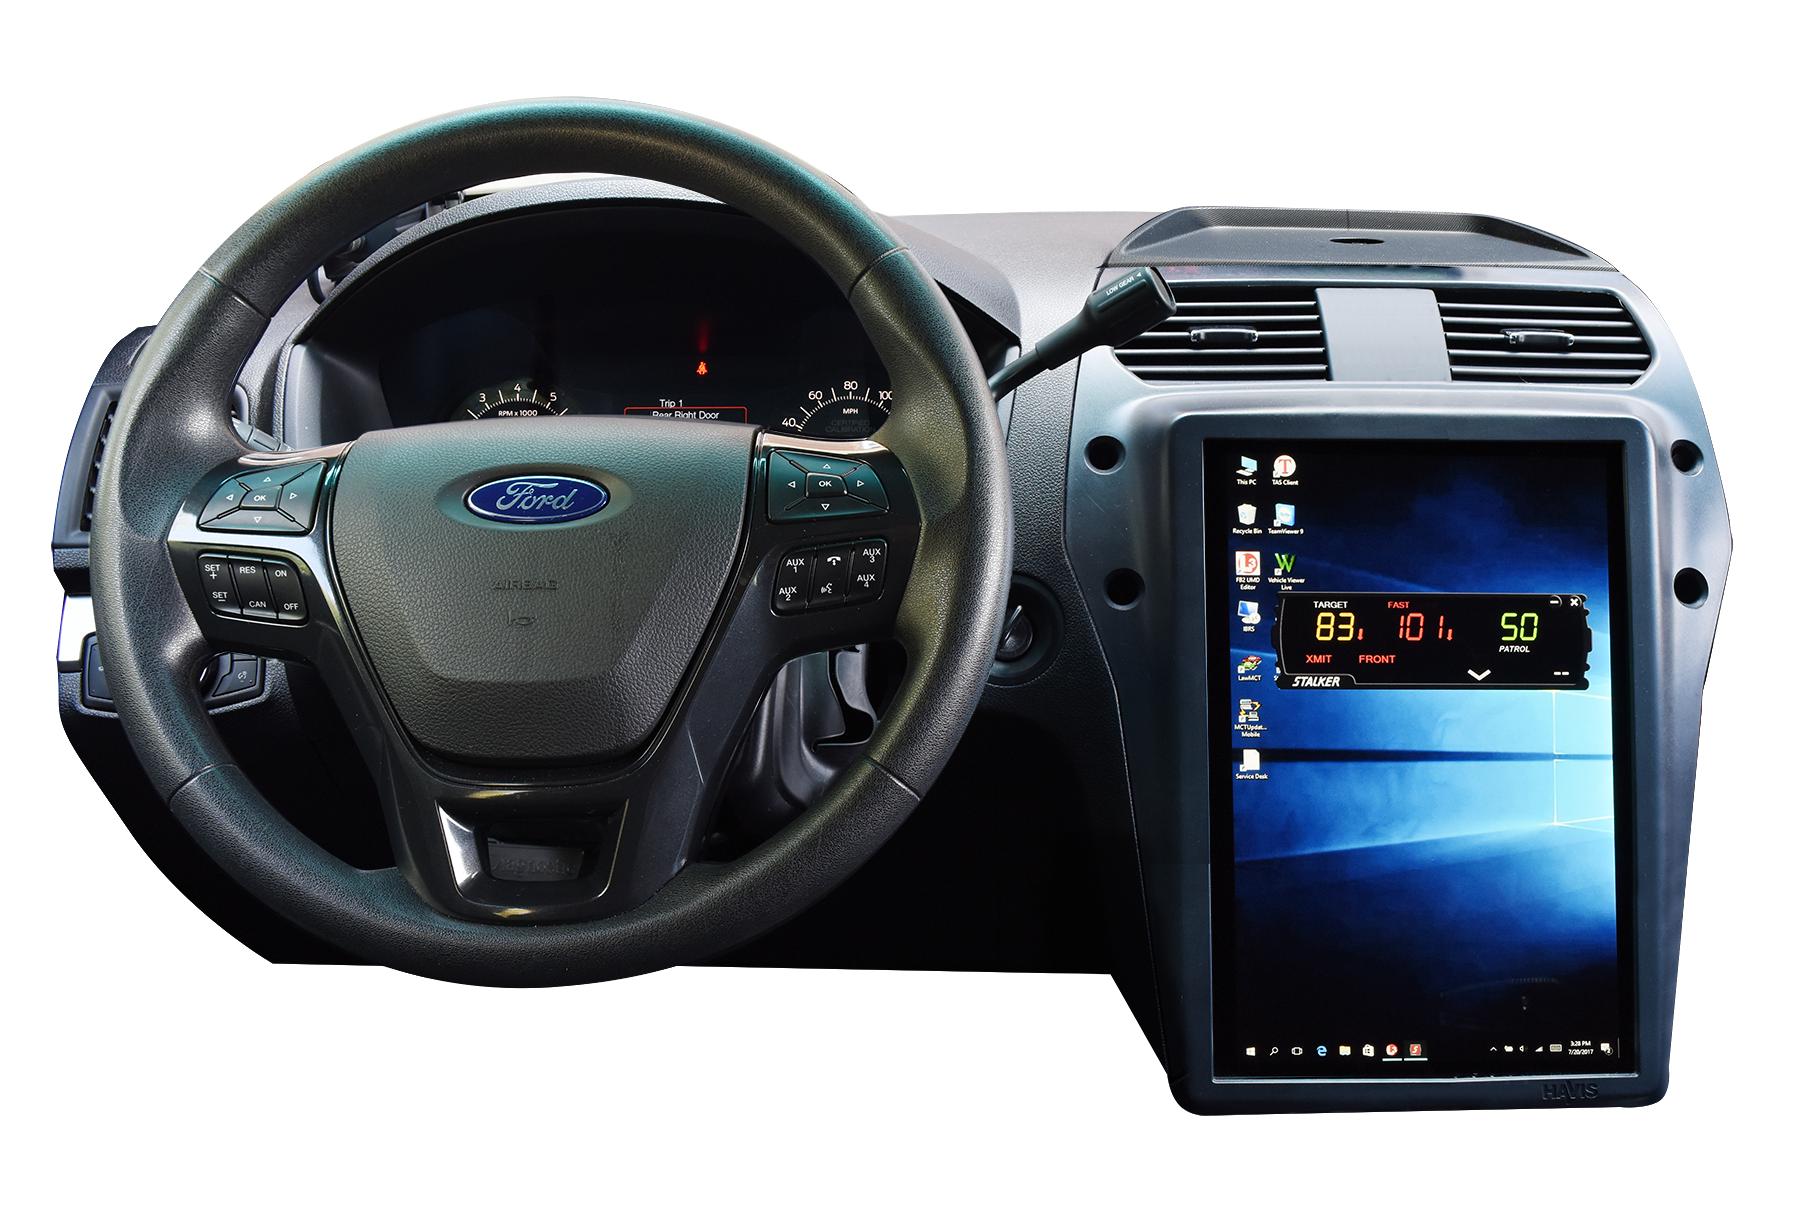 Ford Explorer Limited >> Stalker Radar's Virtual Display Is a Game-Changer for Officer In-Car Safety